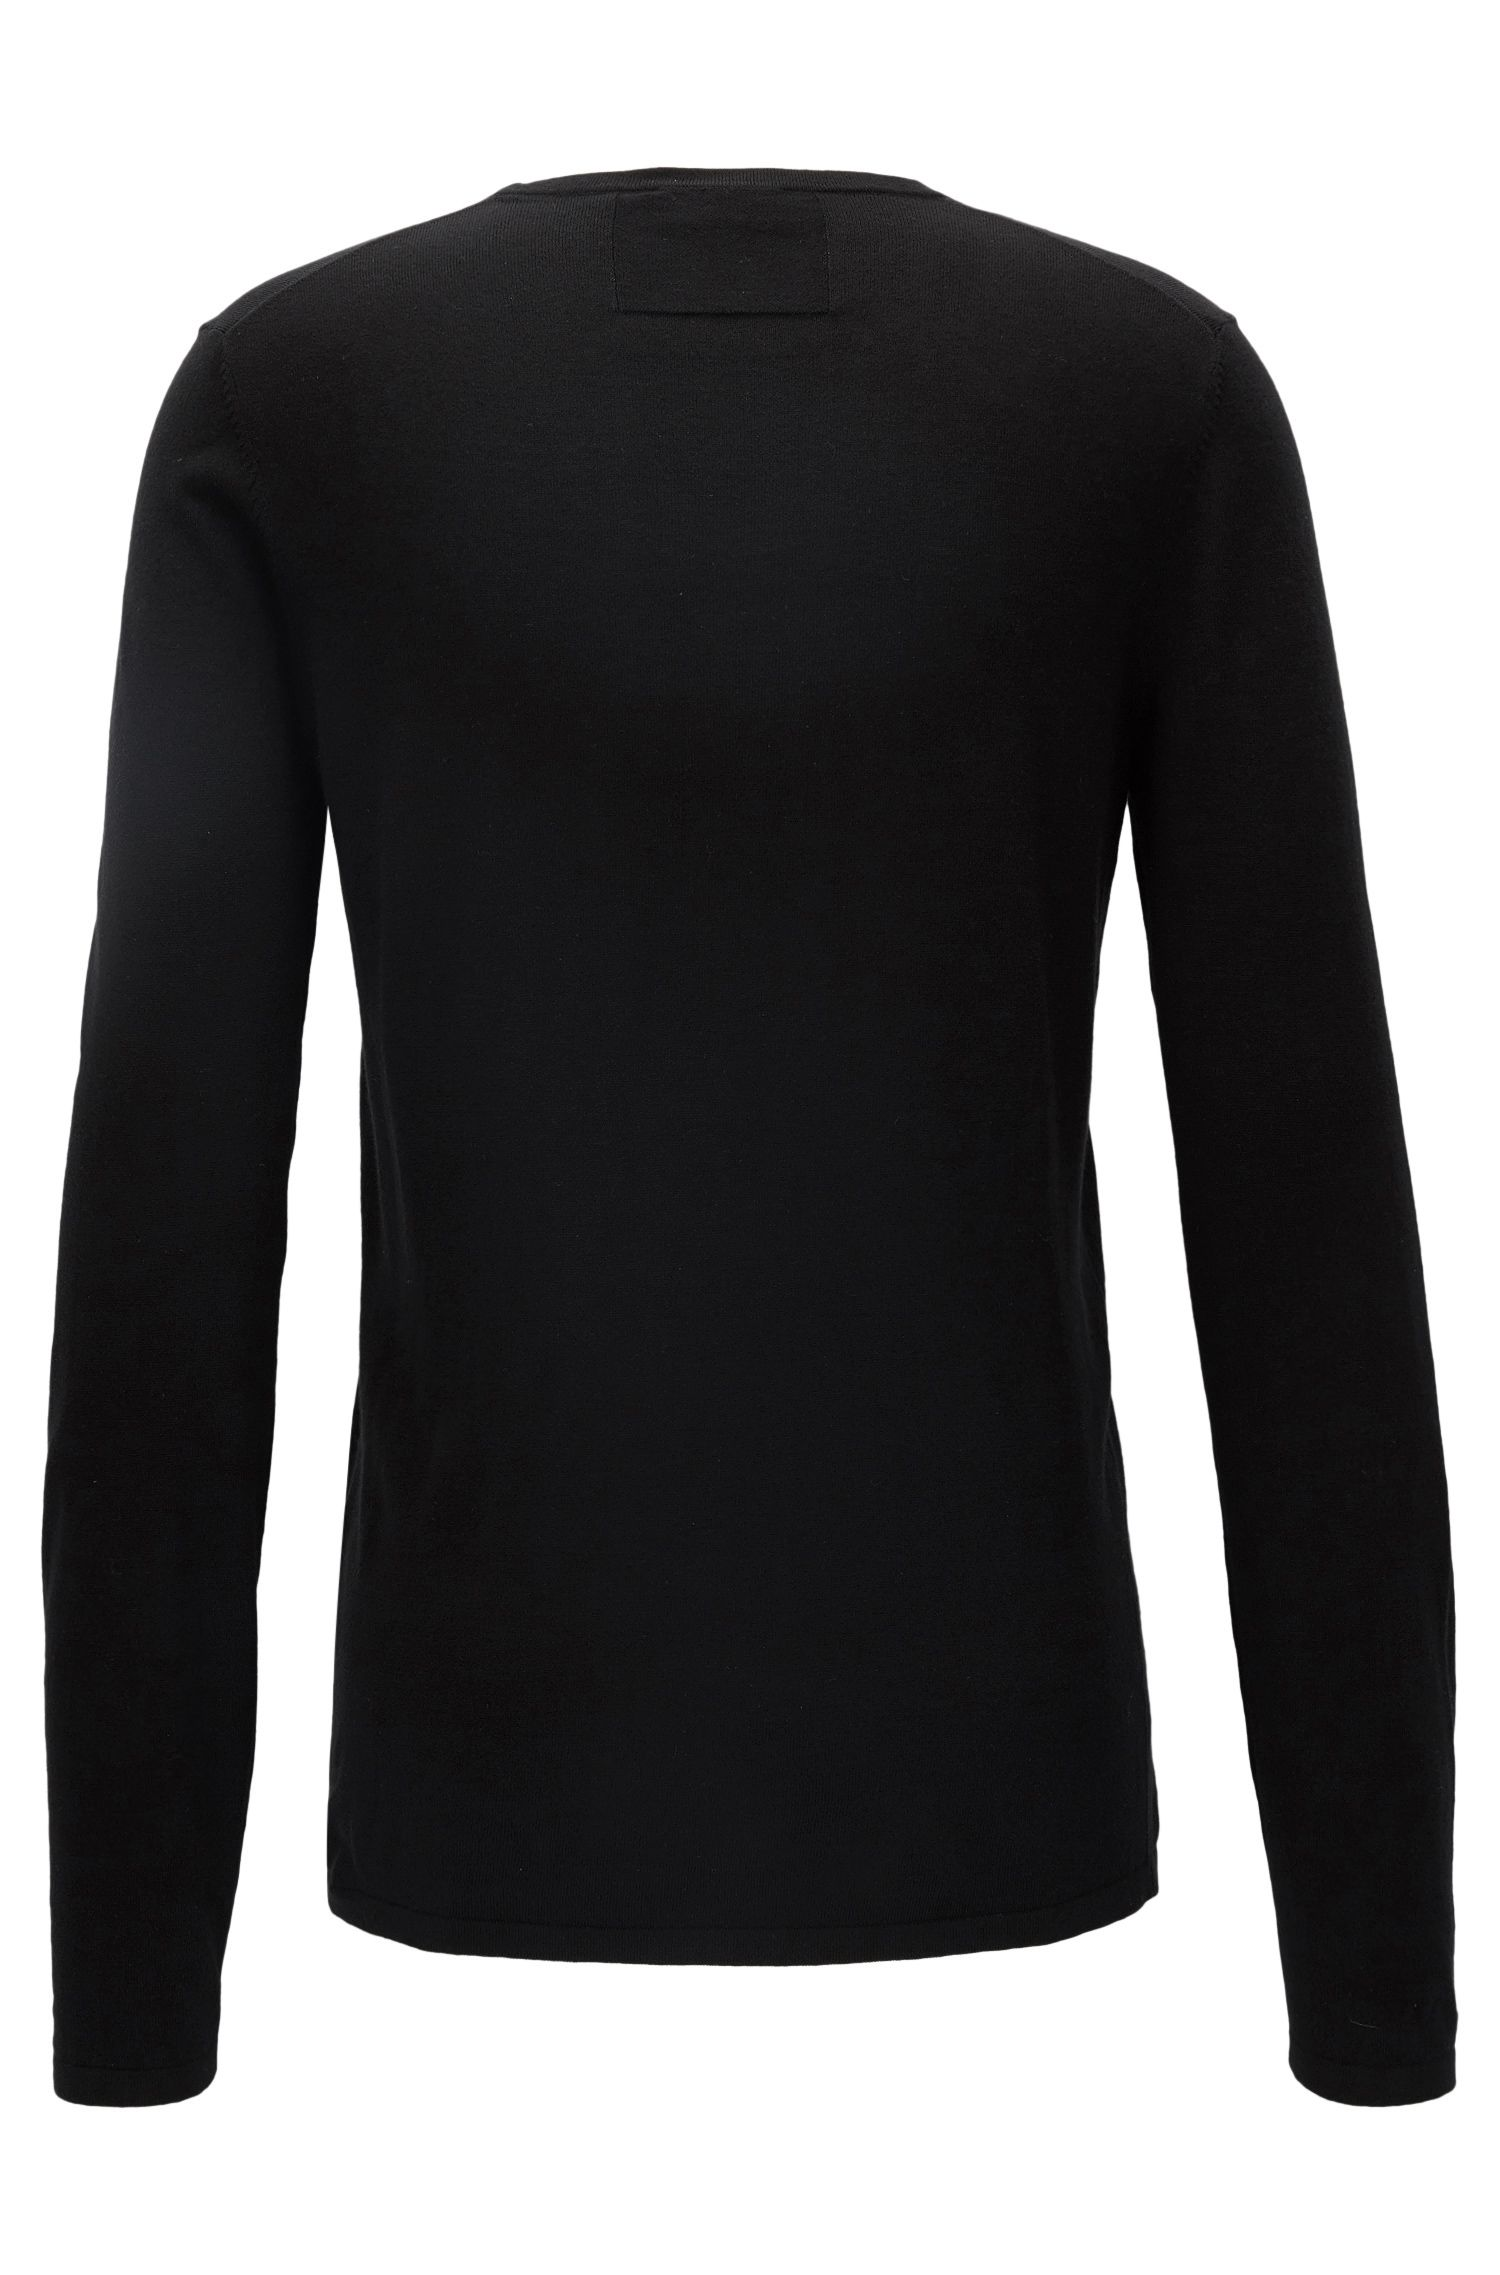 Cotton Blend Sweater | San Bastio